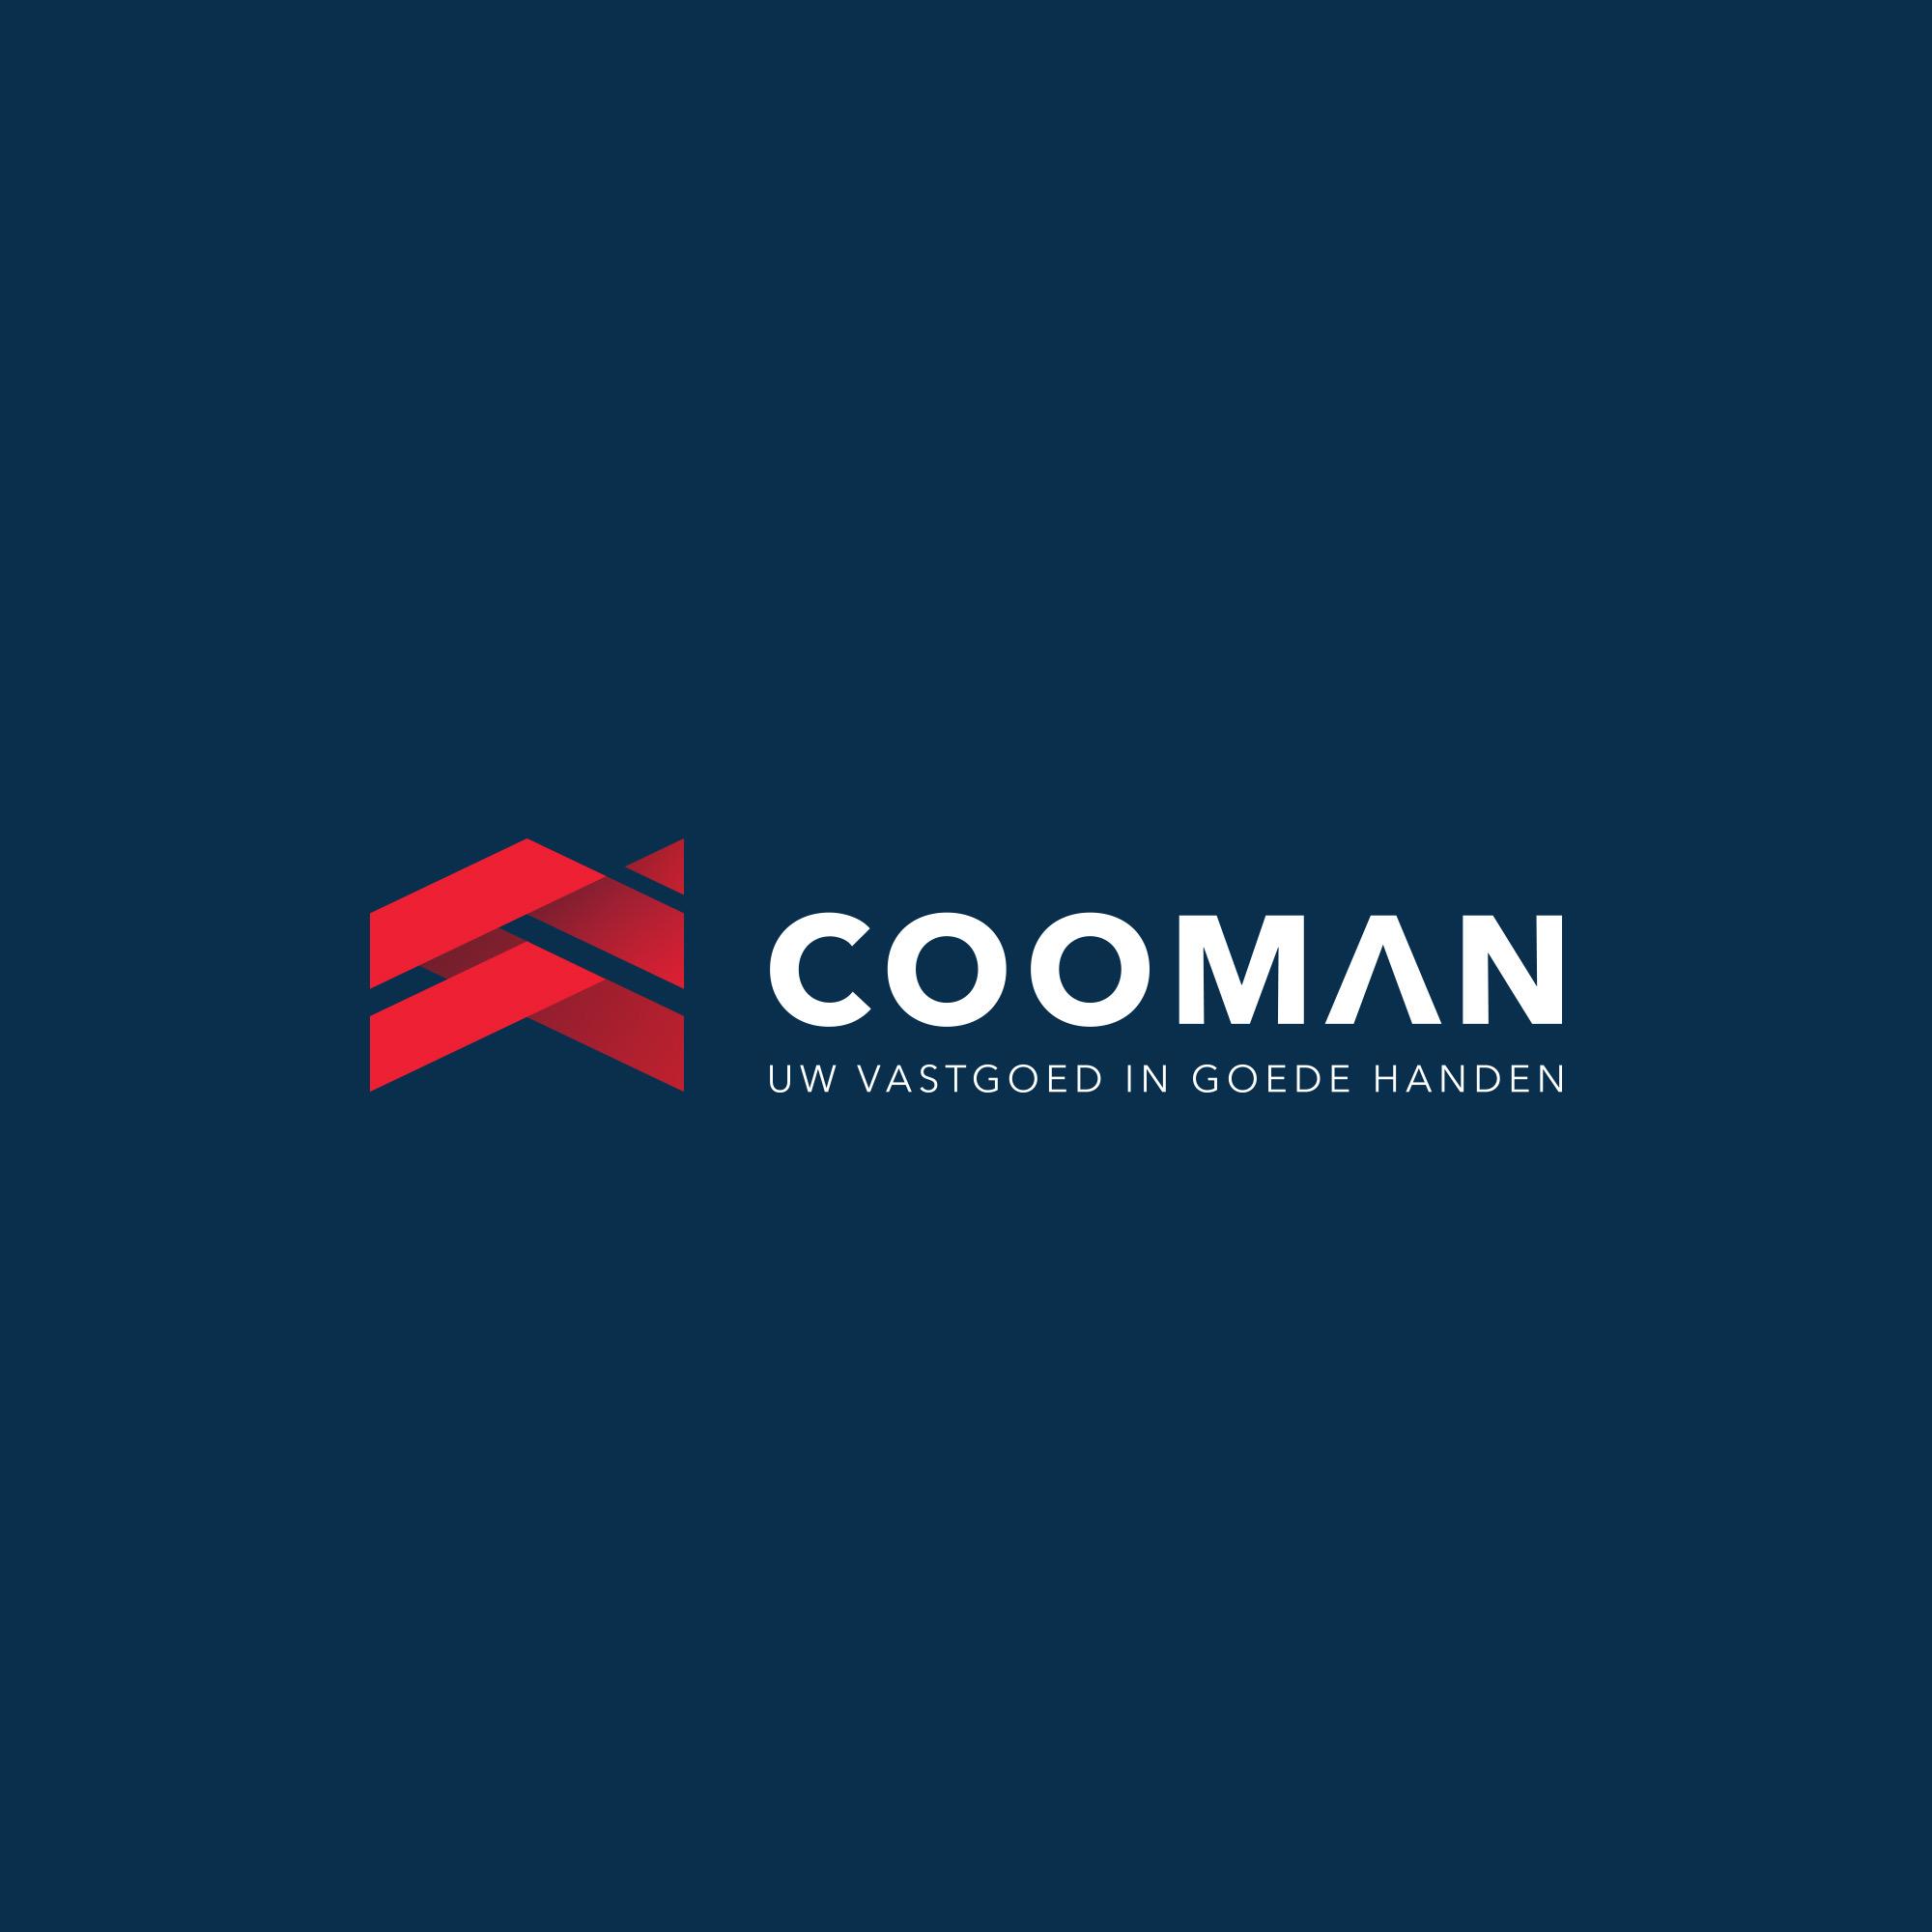 https://sconcept.be/wp-content/uploads/2020/01/logo-cooman-2.jpg